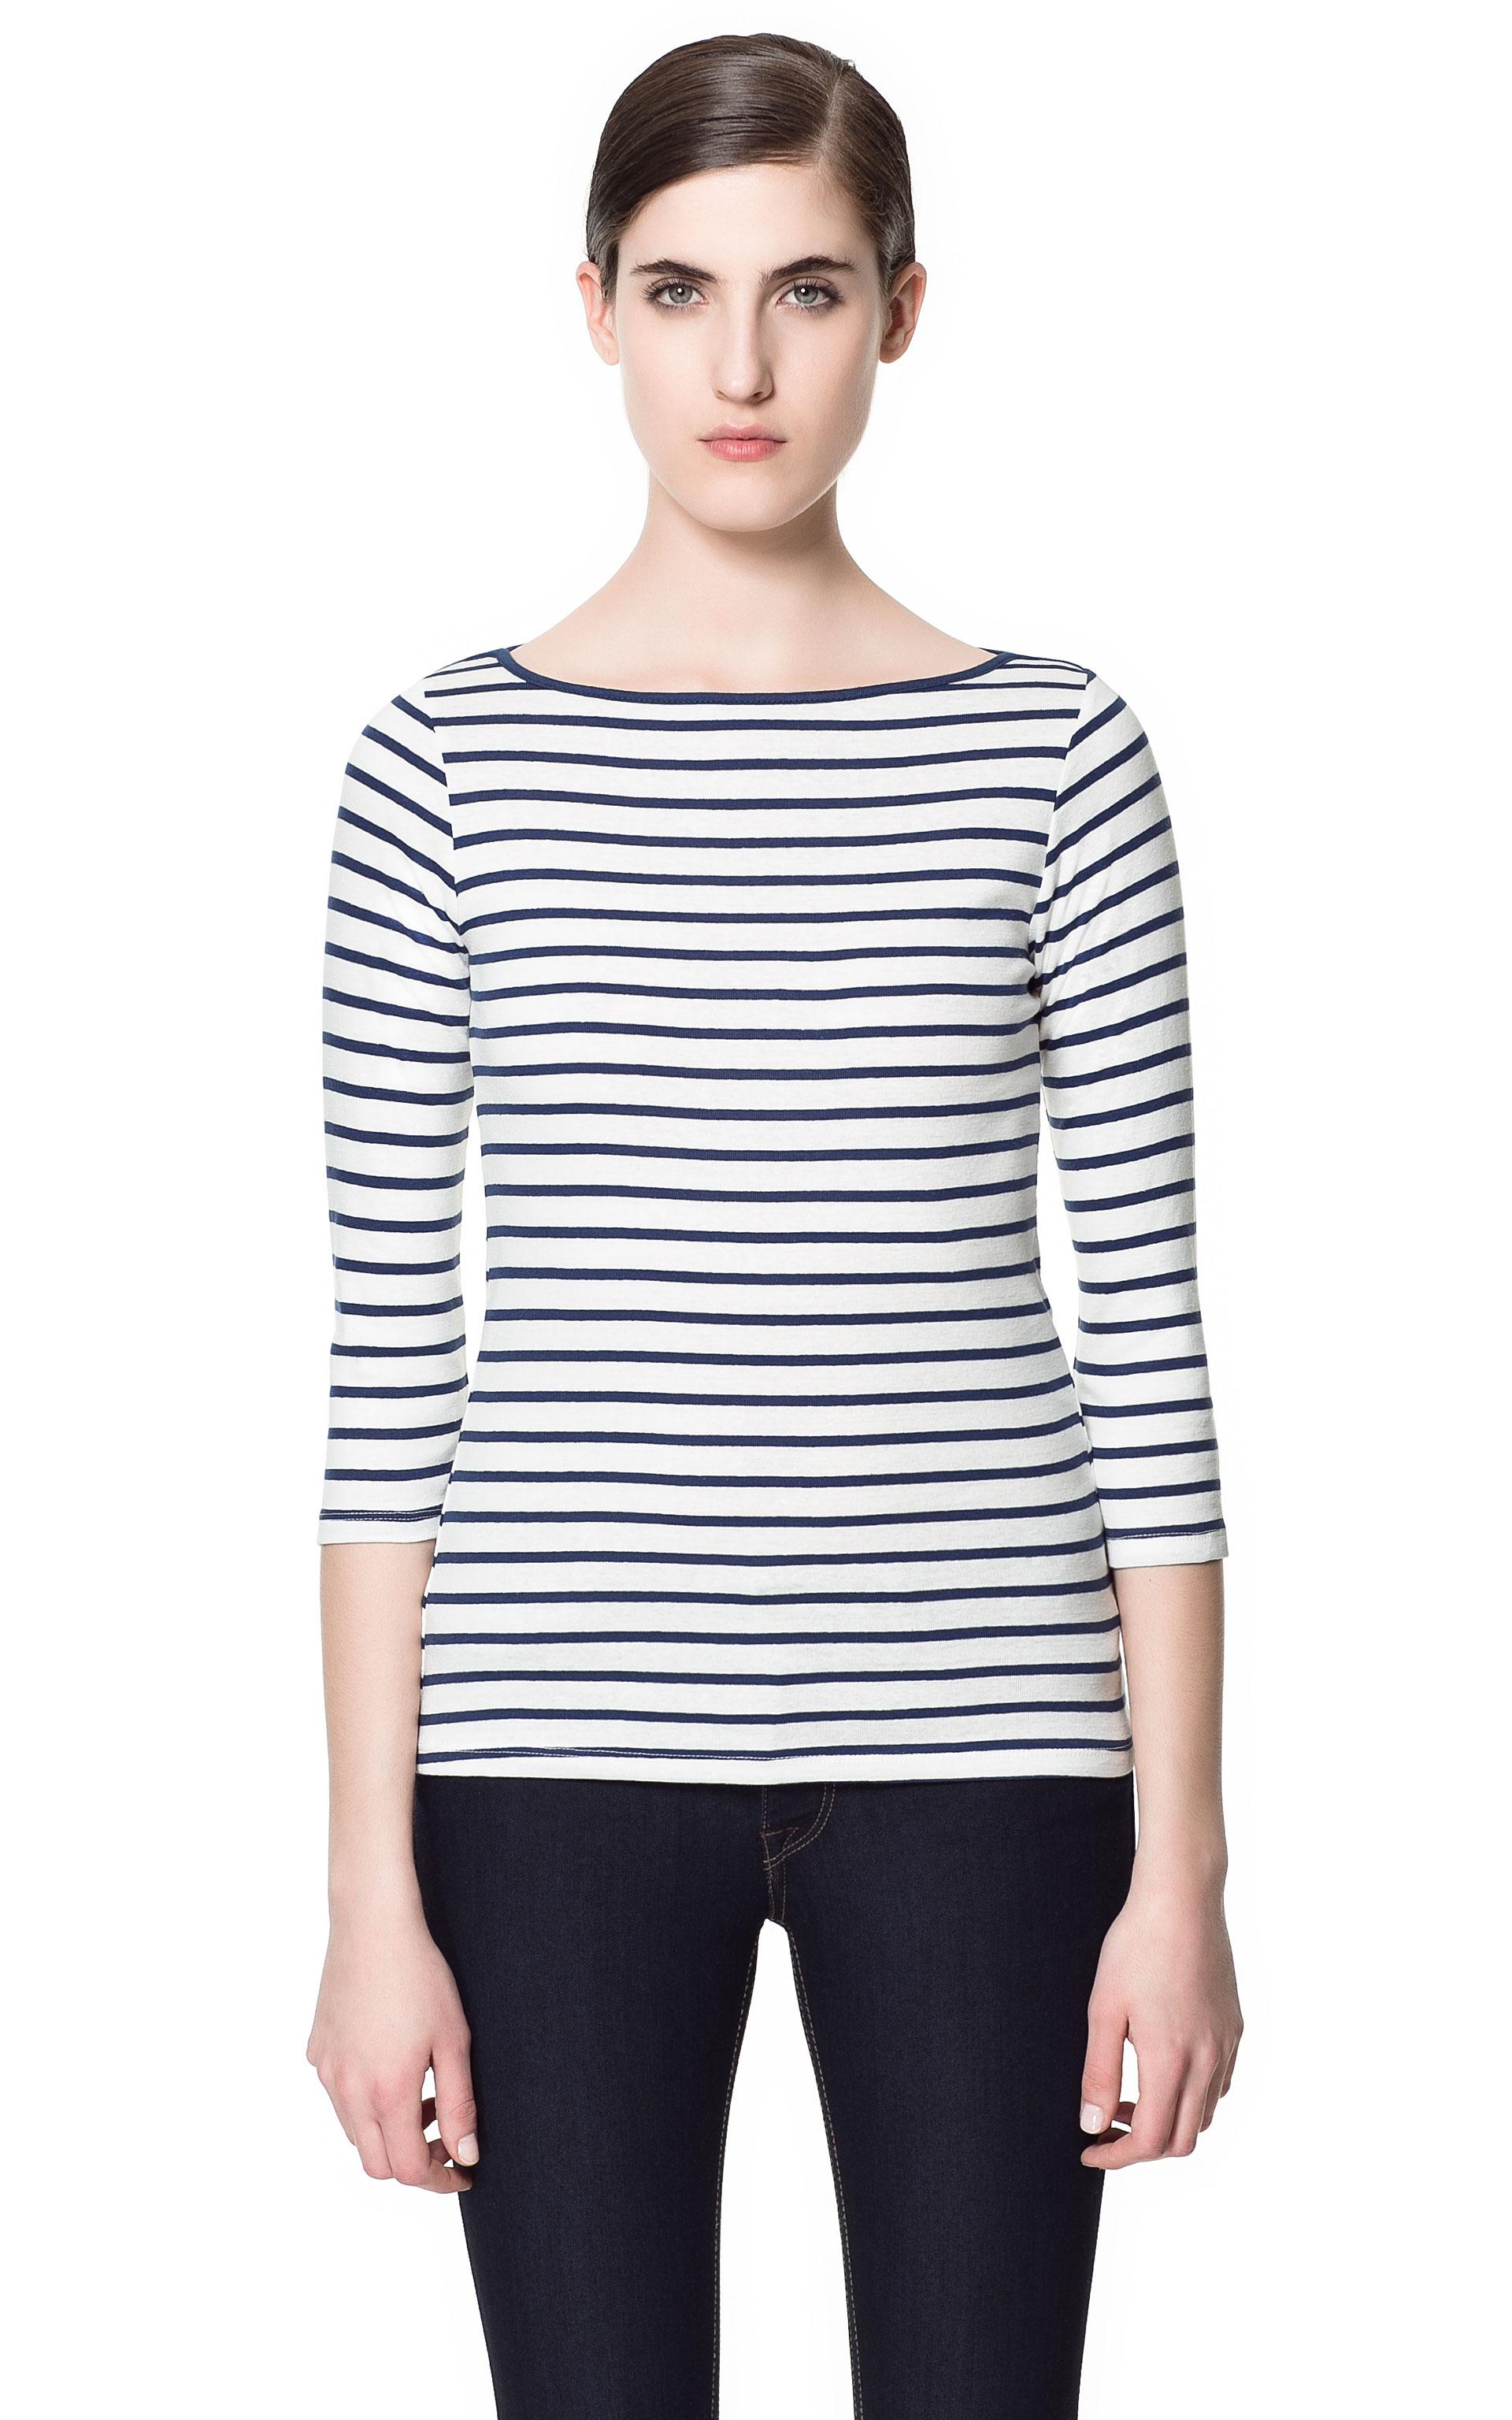 Zara Organic Cotton T-Shirt in White (white/navy)   Lyst